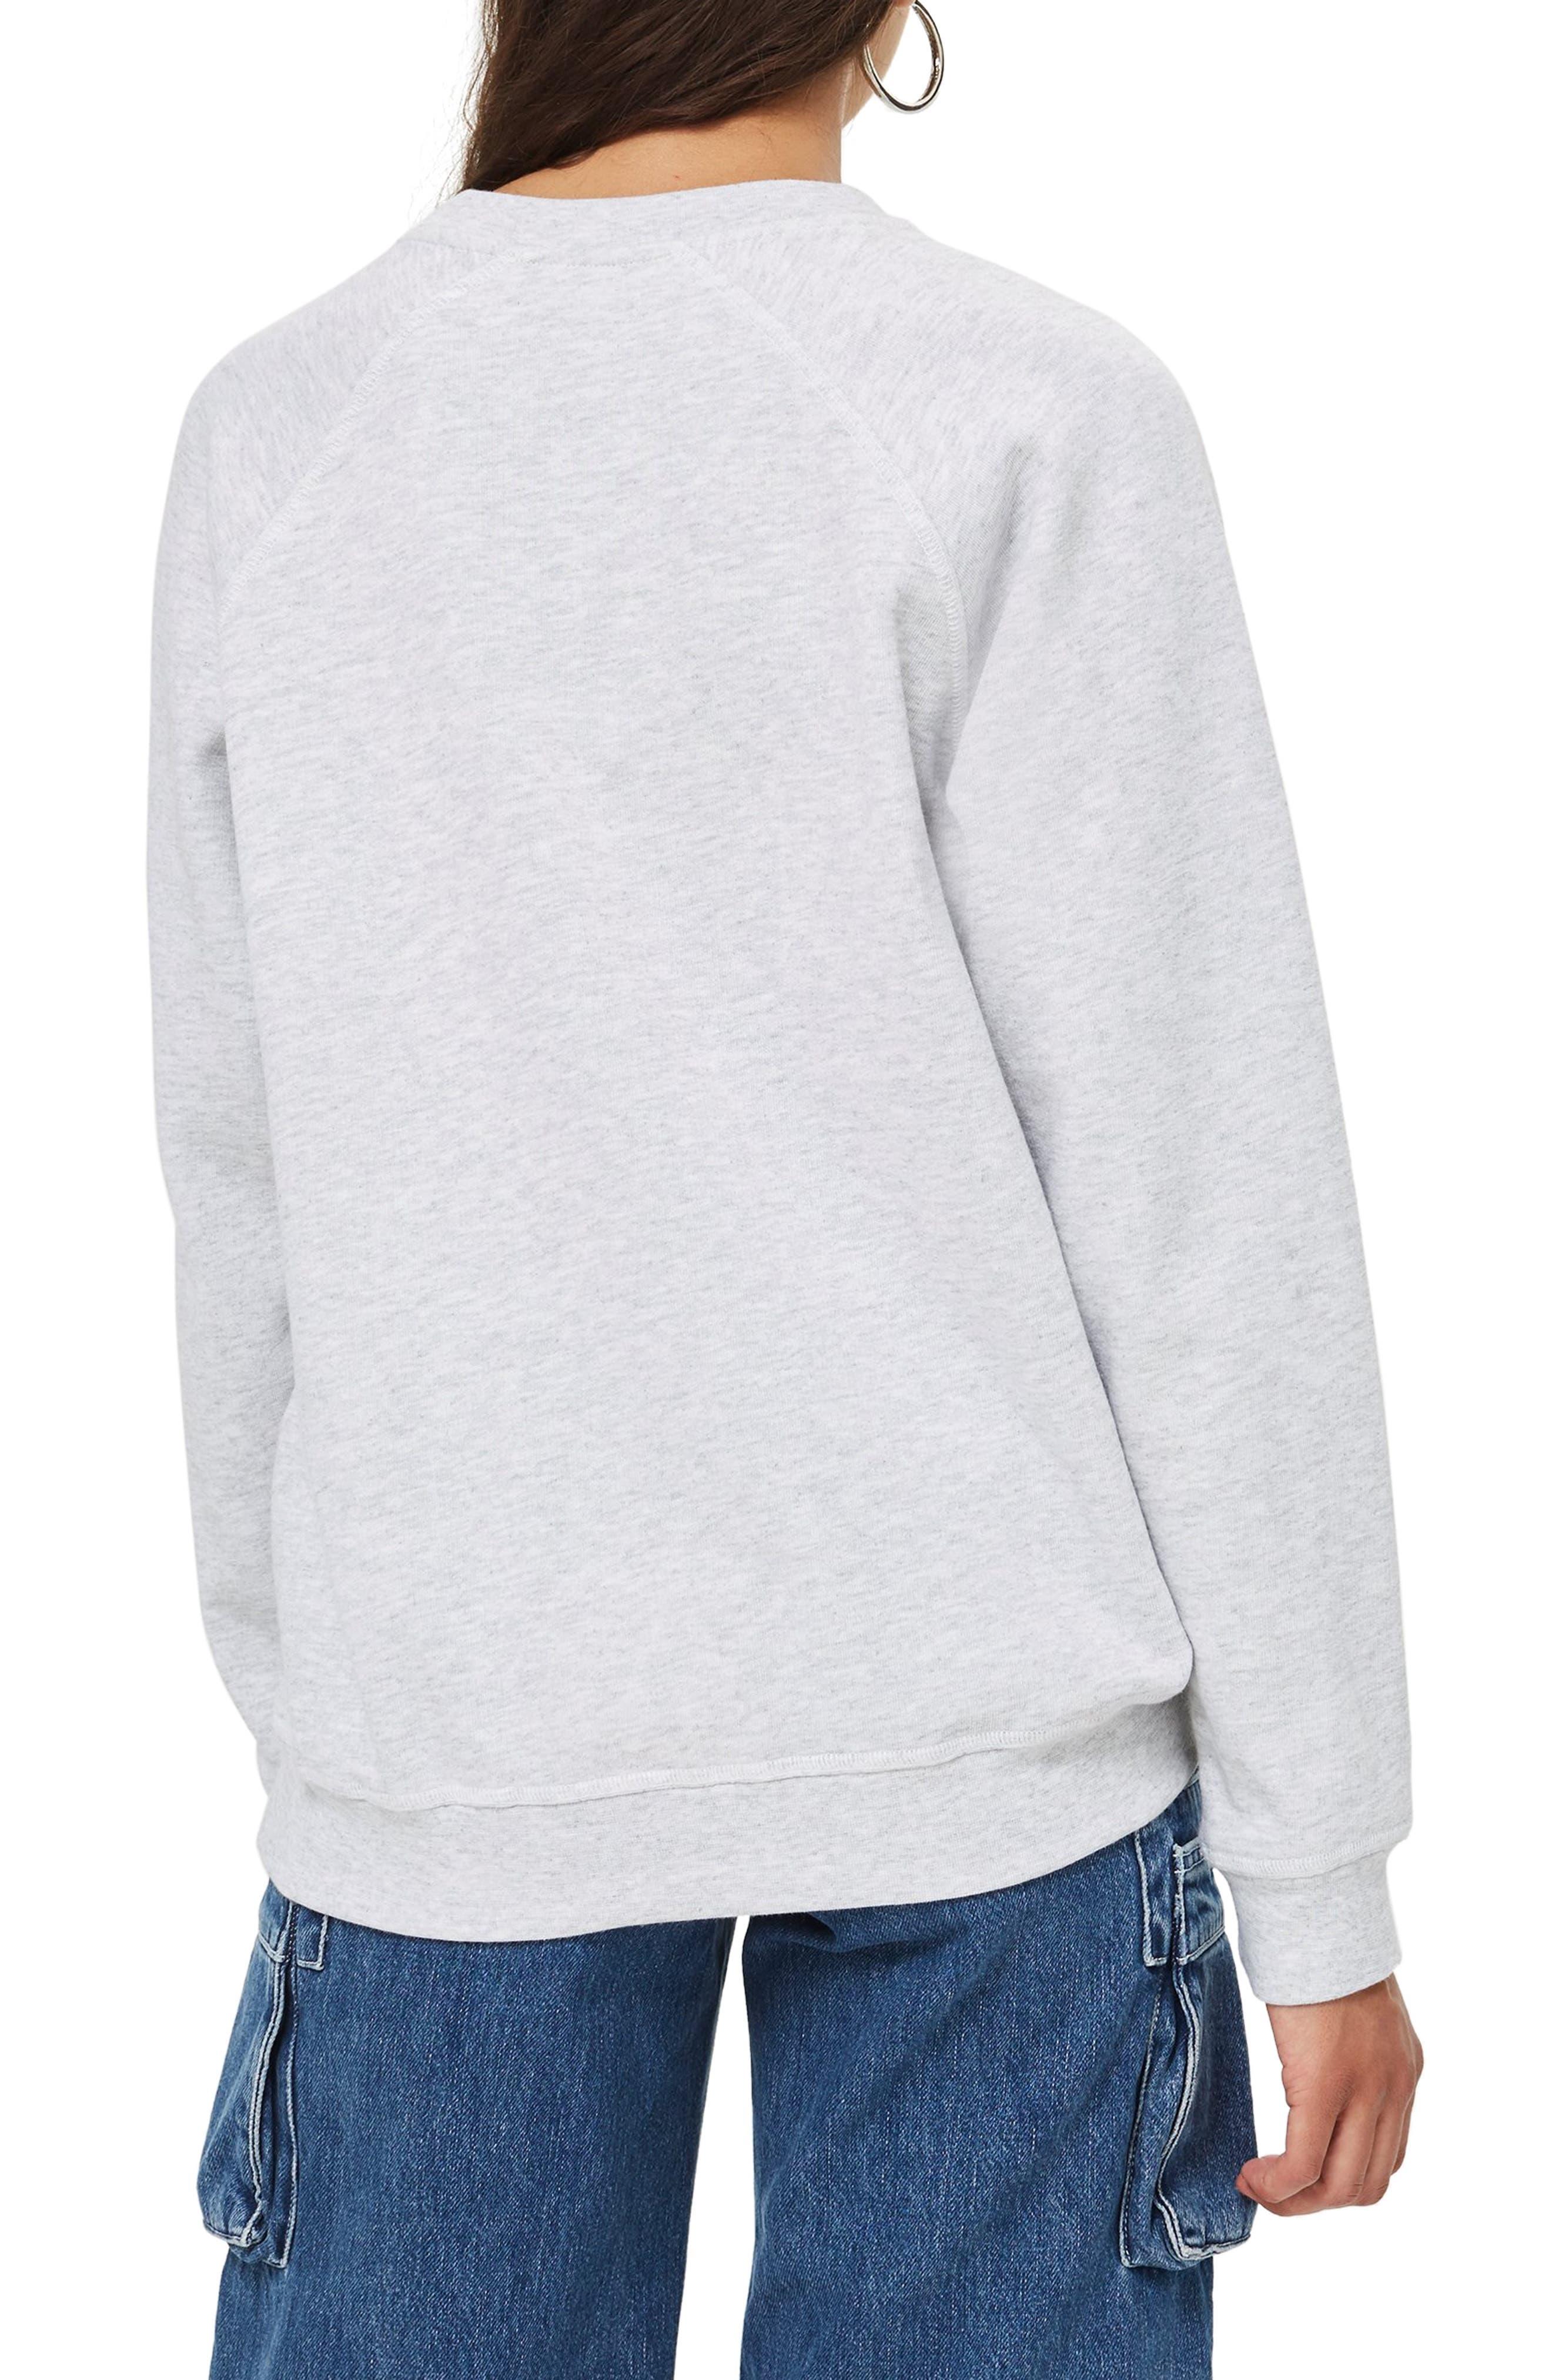 TOPSHOP, Crewneck Sweatshirt, Alternate thumbnail 2, color, 020